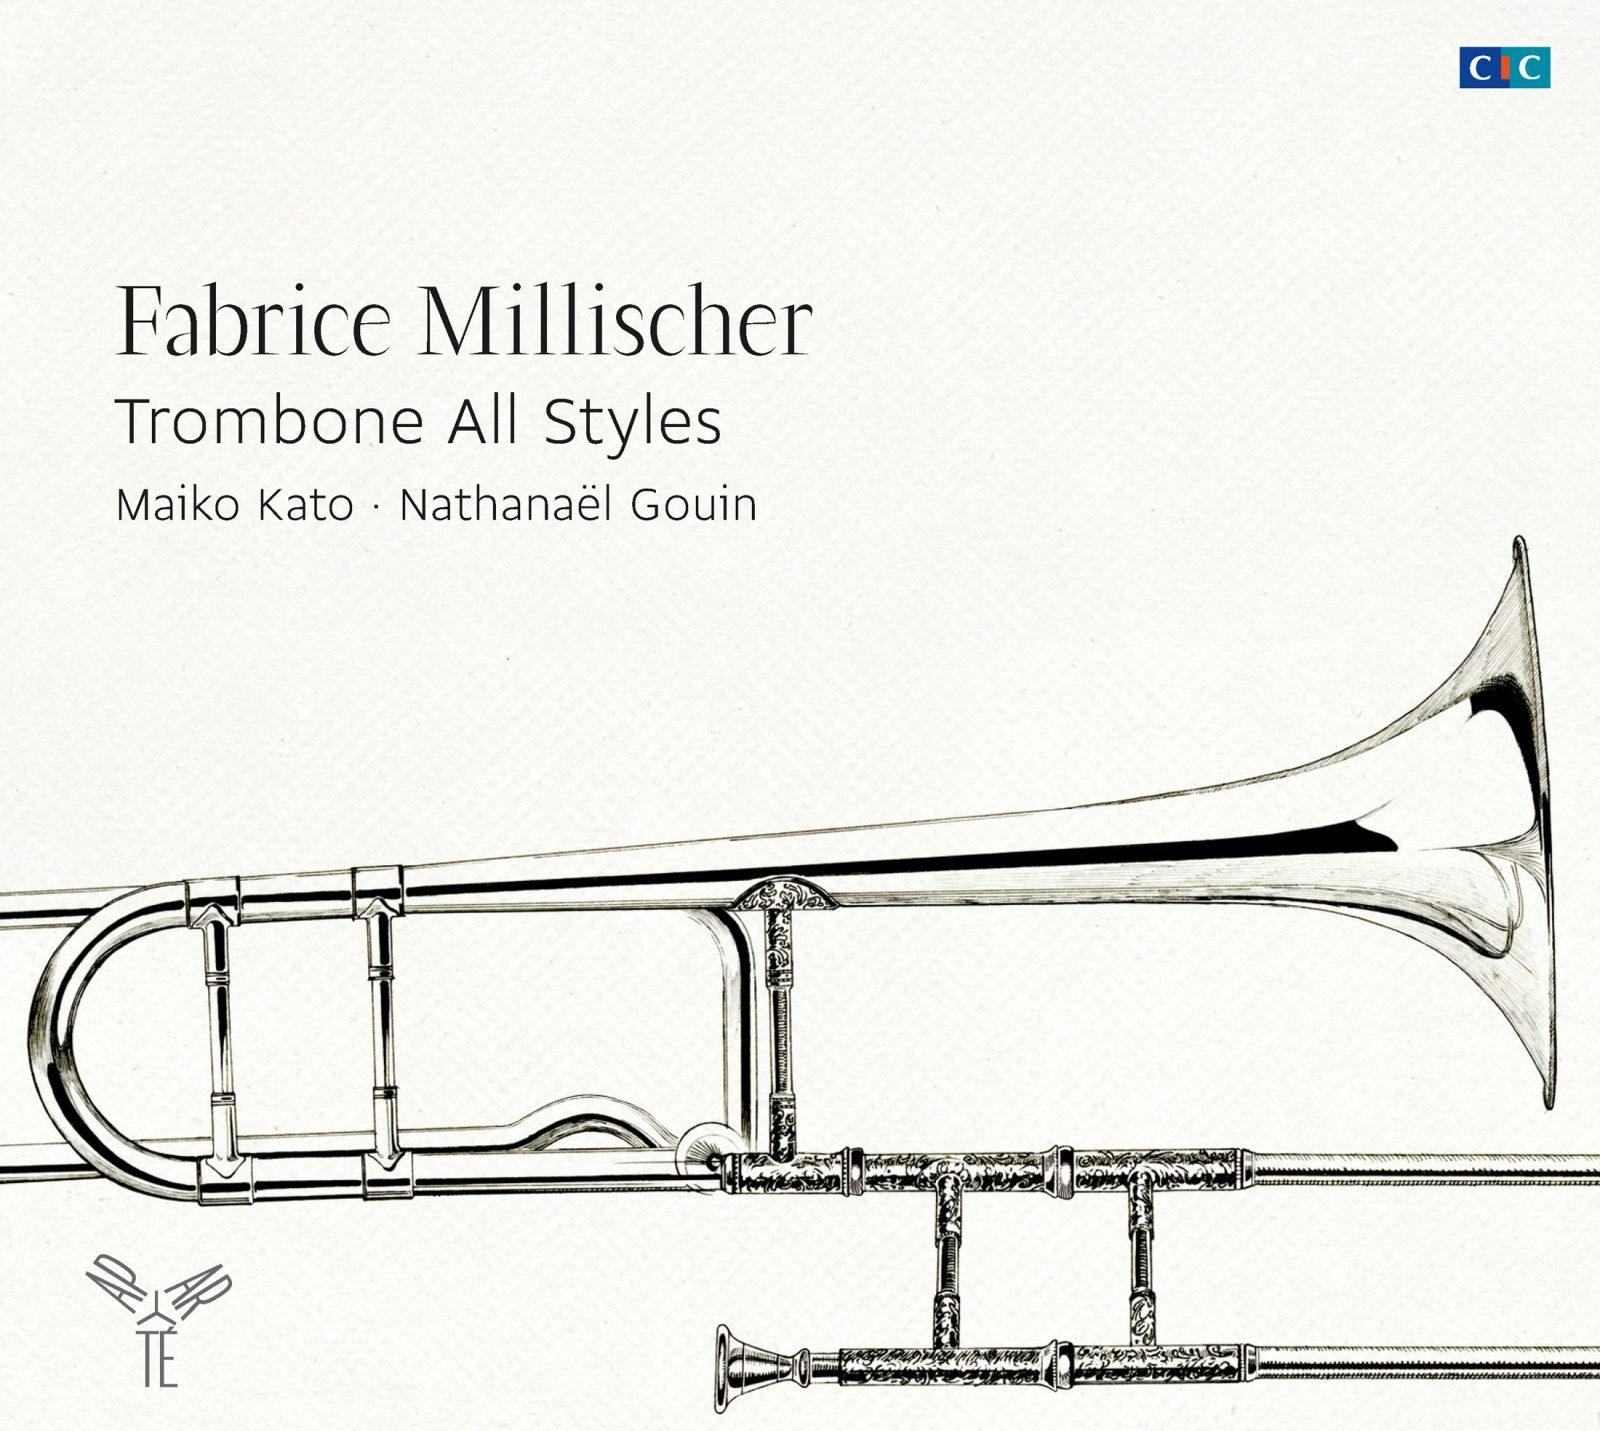 Trombone All Styles